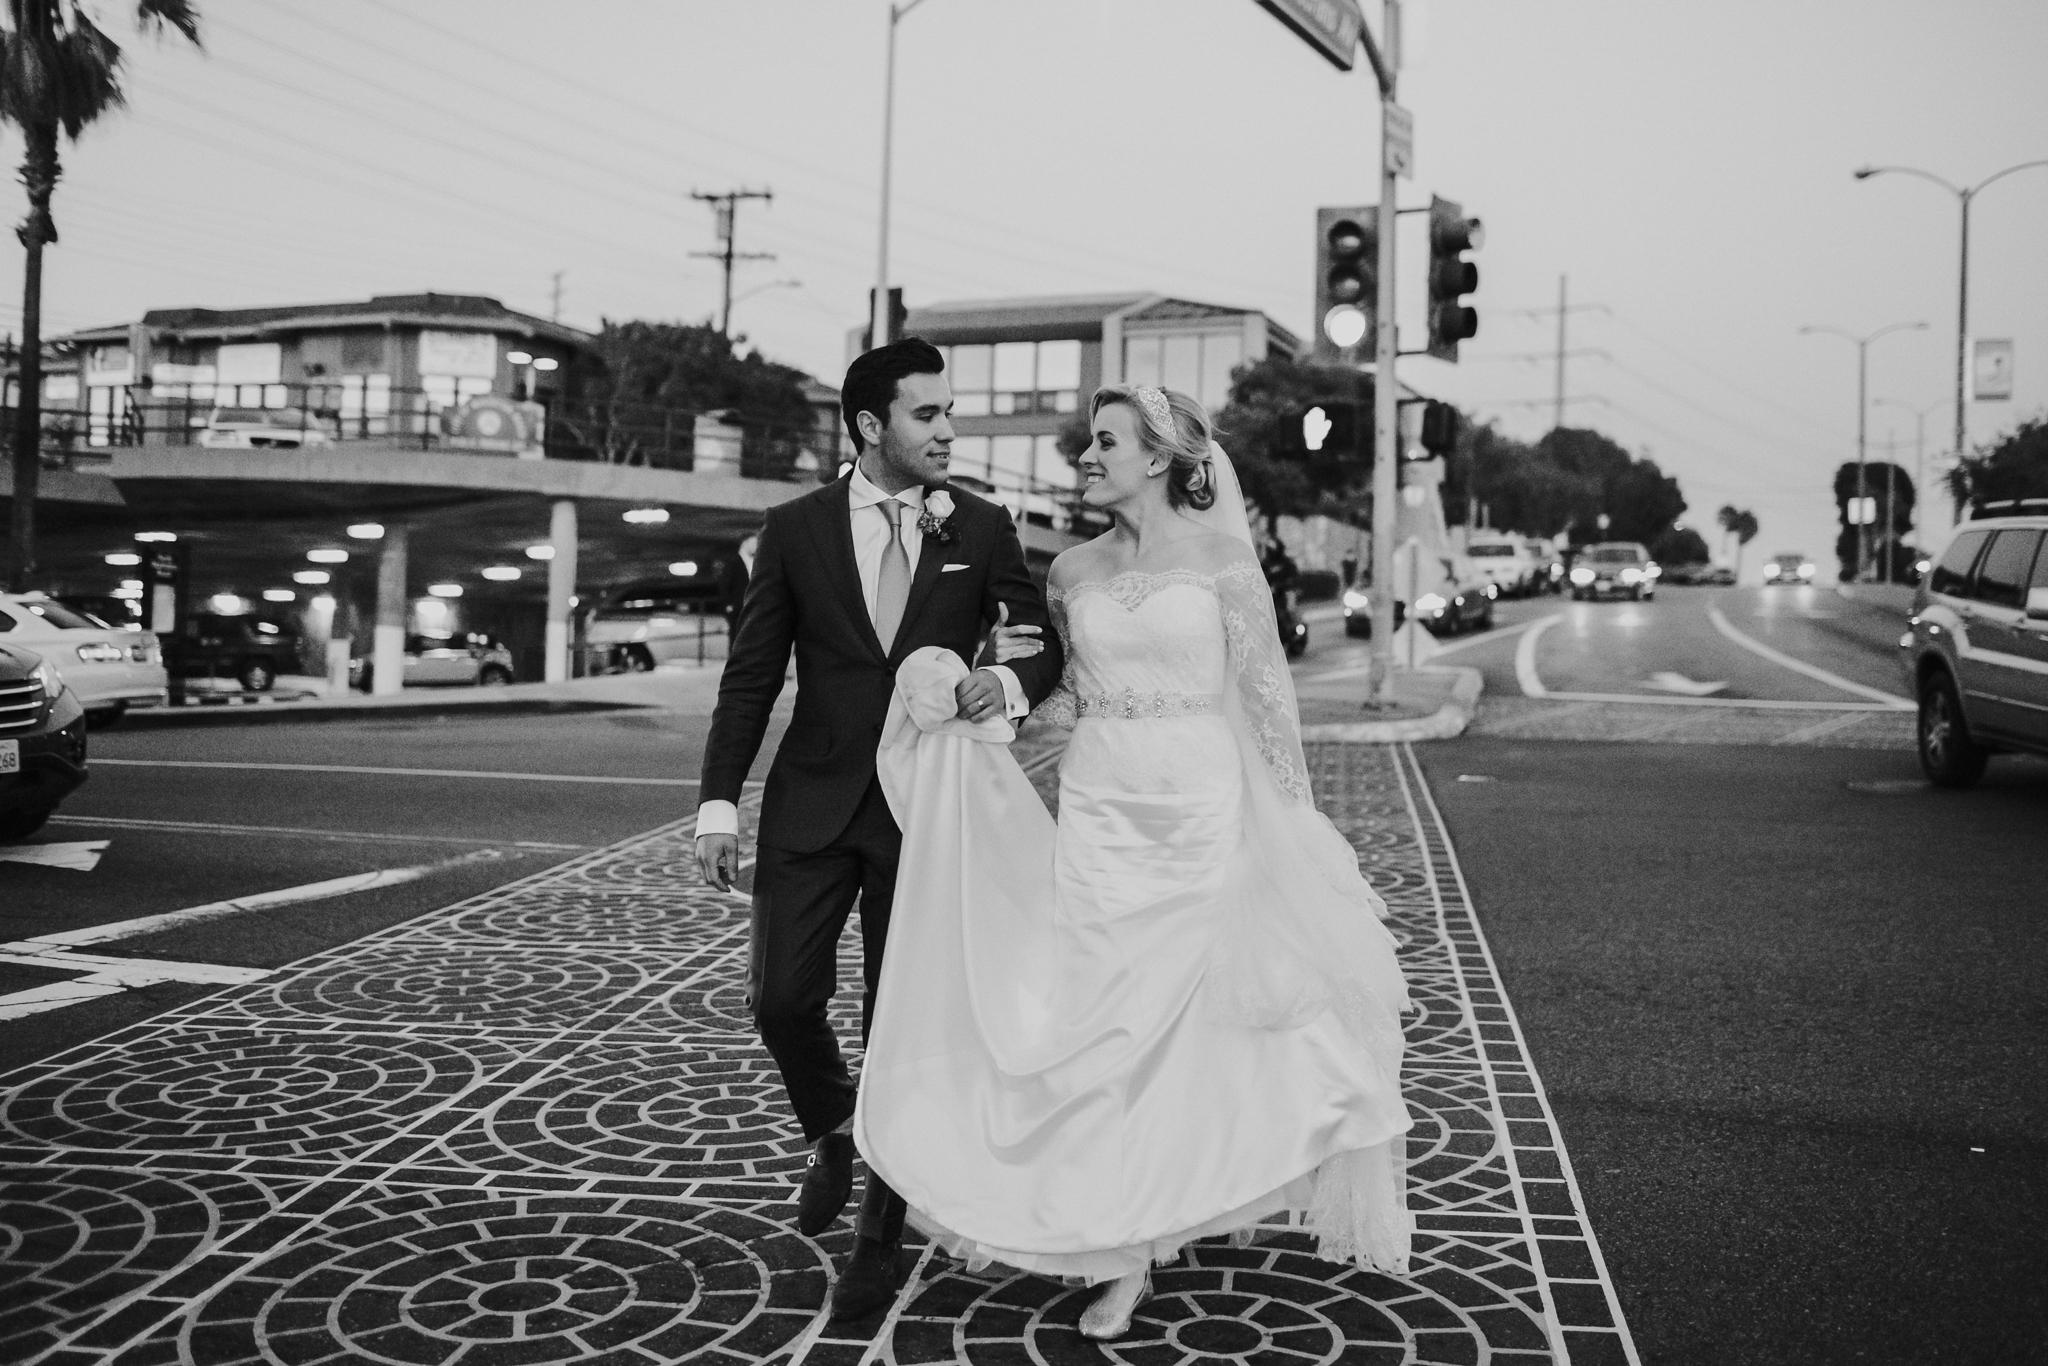 20151230_hussem_wedding_0677_web.jpg